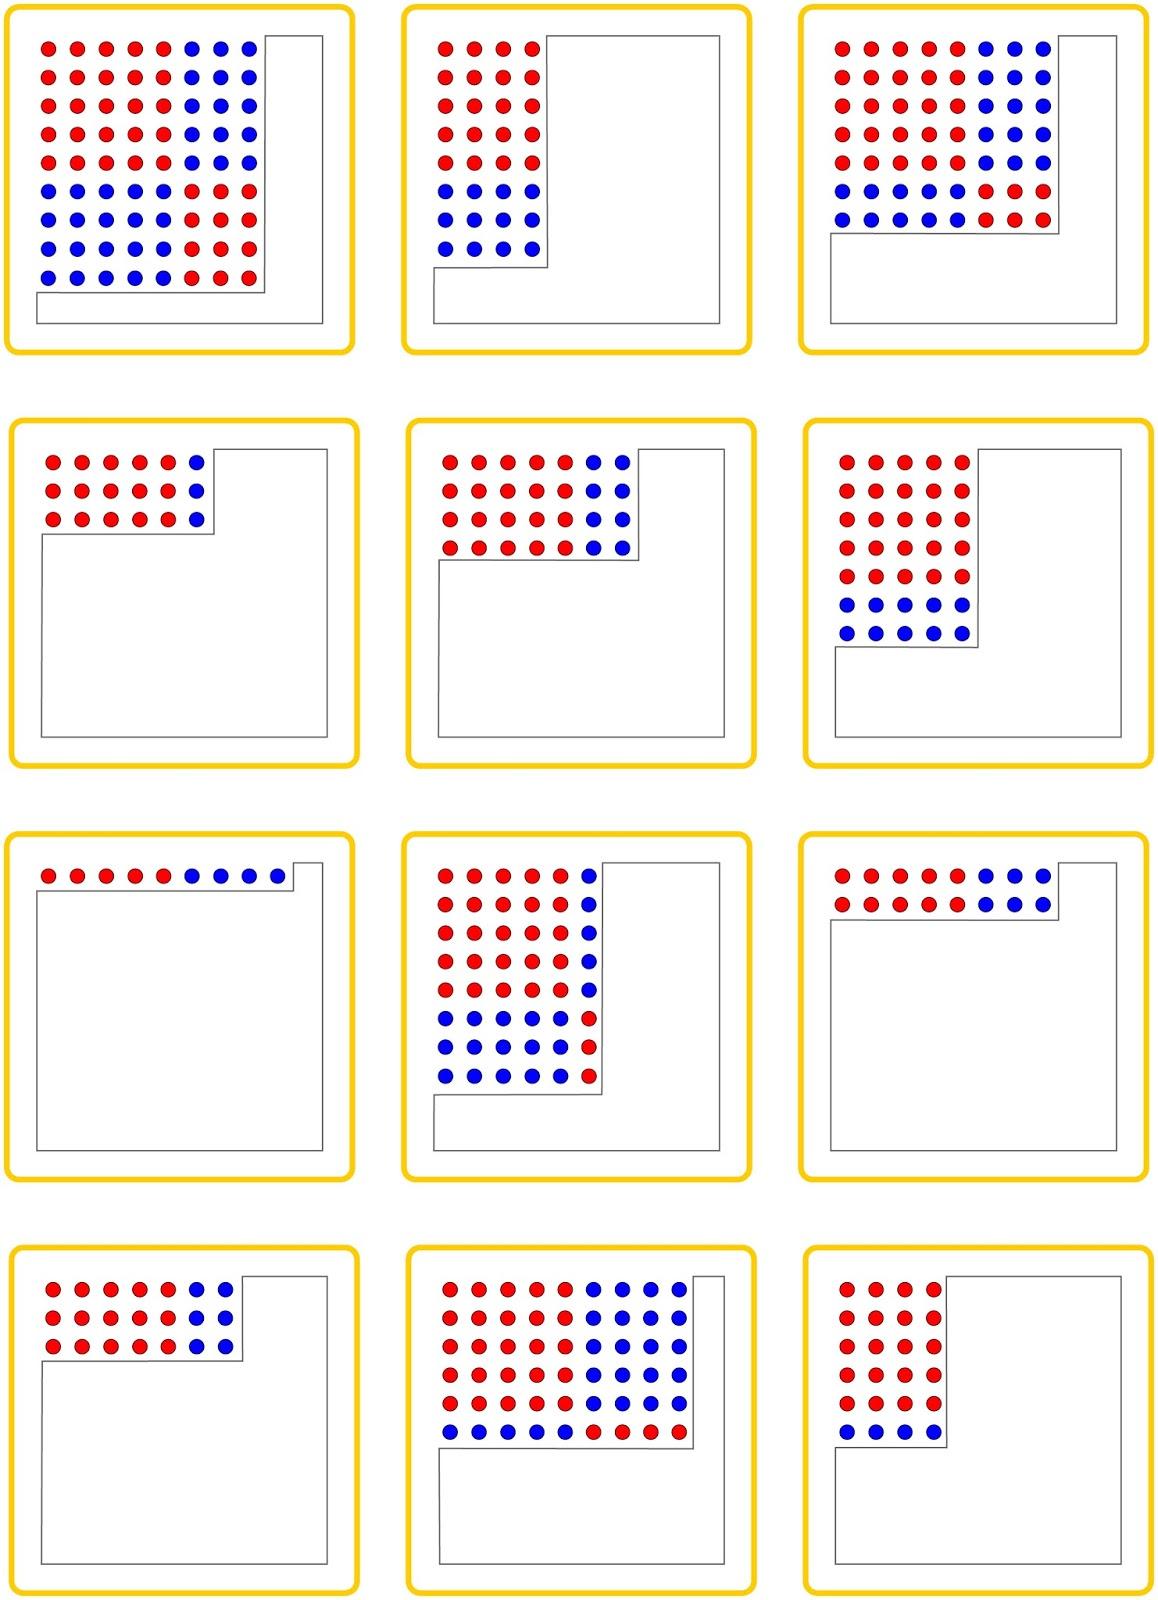 Einmaleins  Quadratzahlen  GrundschuleKAPIERT